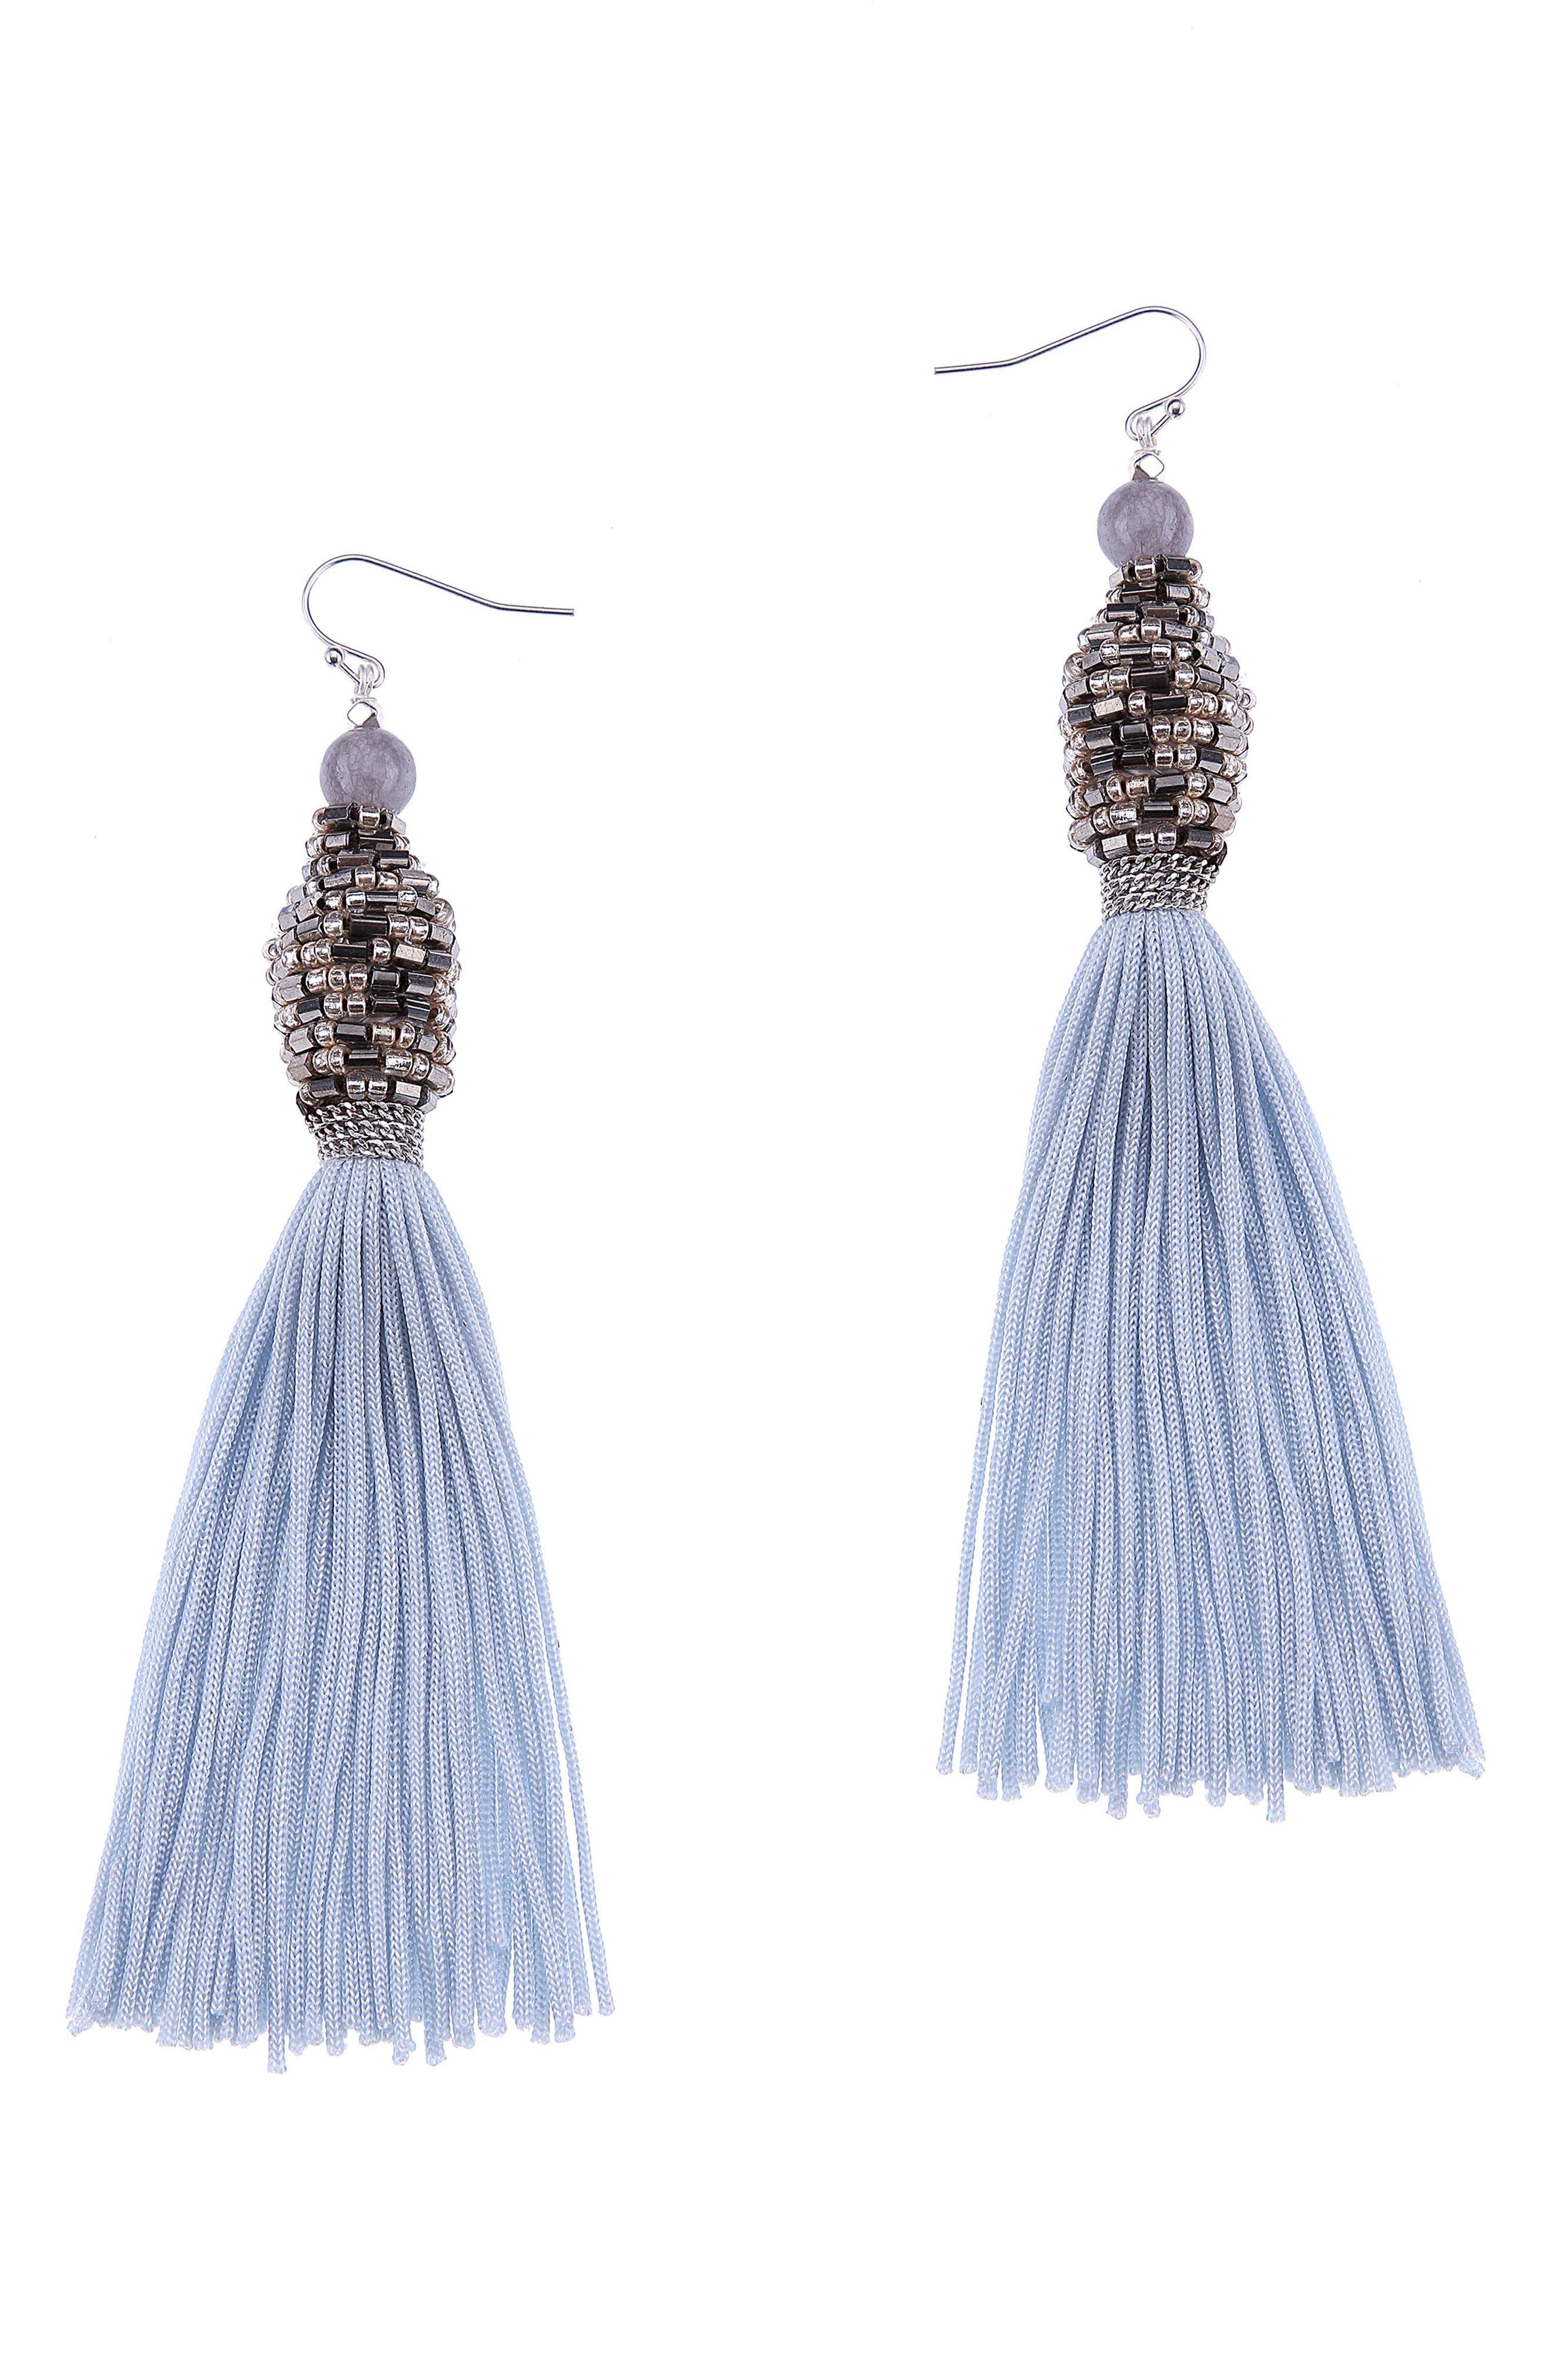 Tassel Earrings,                         Main,                         color, 020